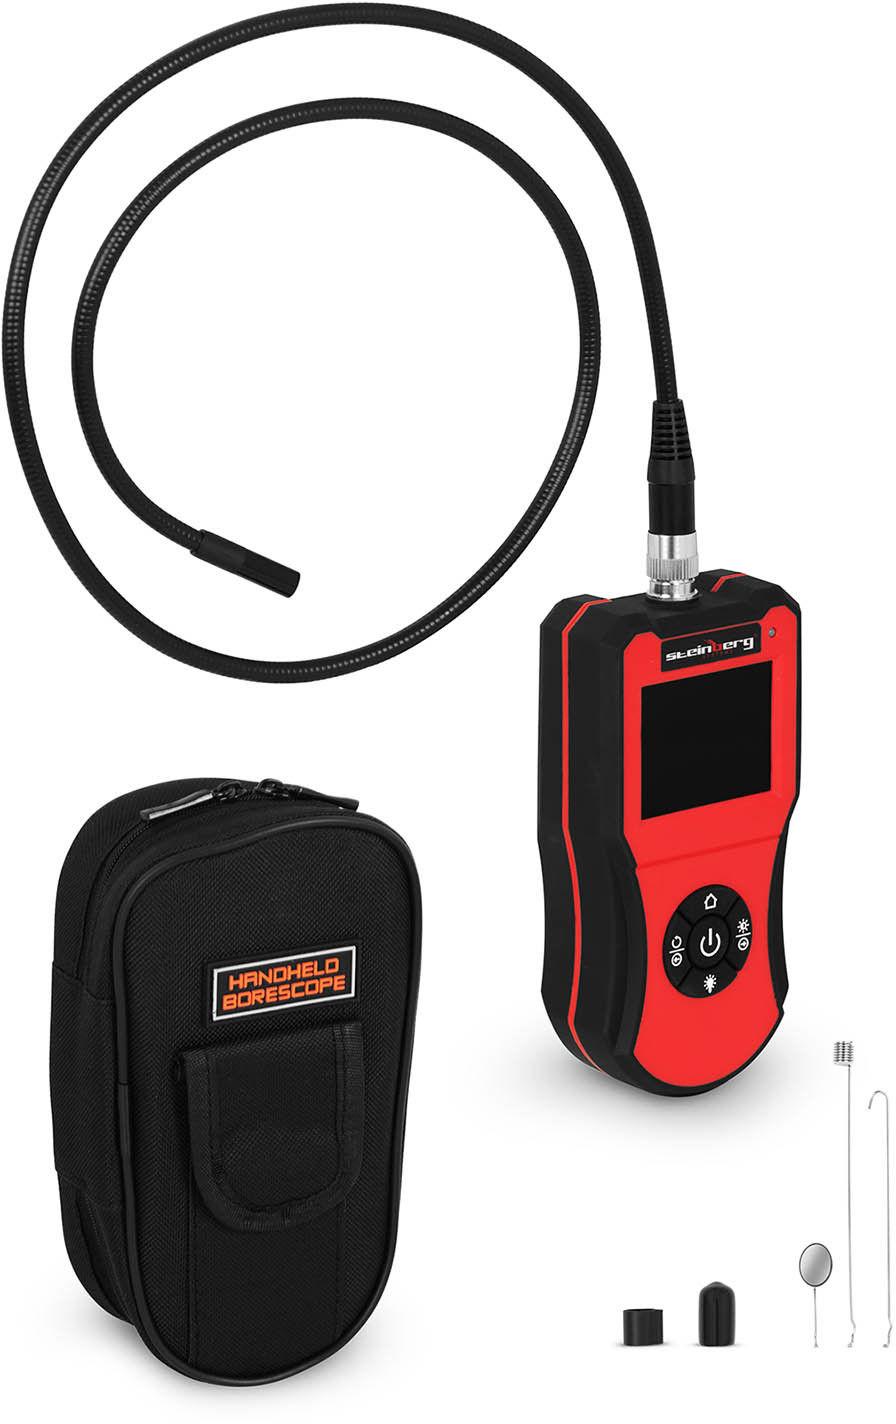 Kamera endoskopowa - 1000 mm - 8,5 mm - Steinberg Systems - SBS-EC-85 - 3 lata gwarancji/wysyłka w 24h